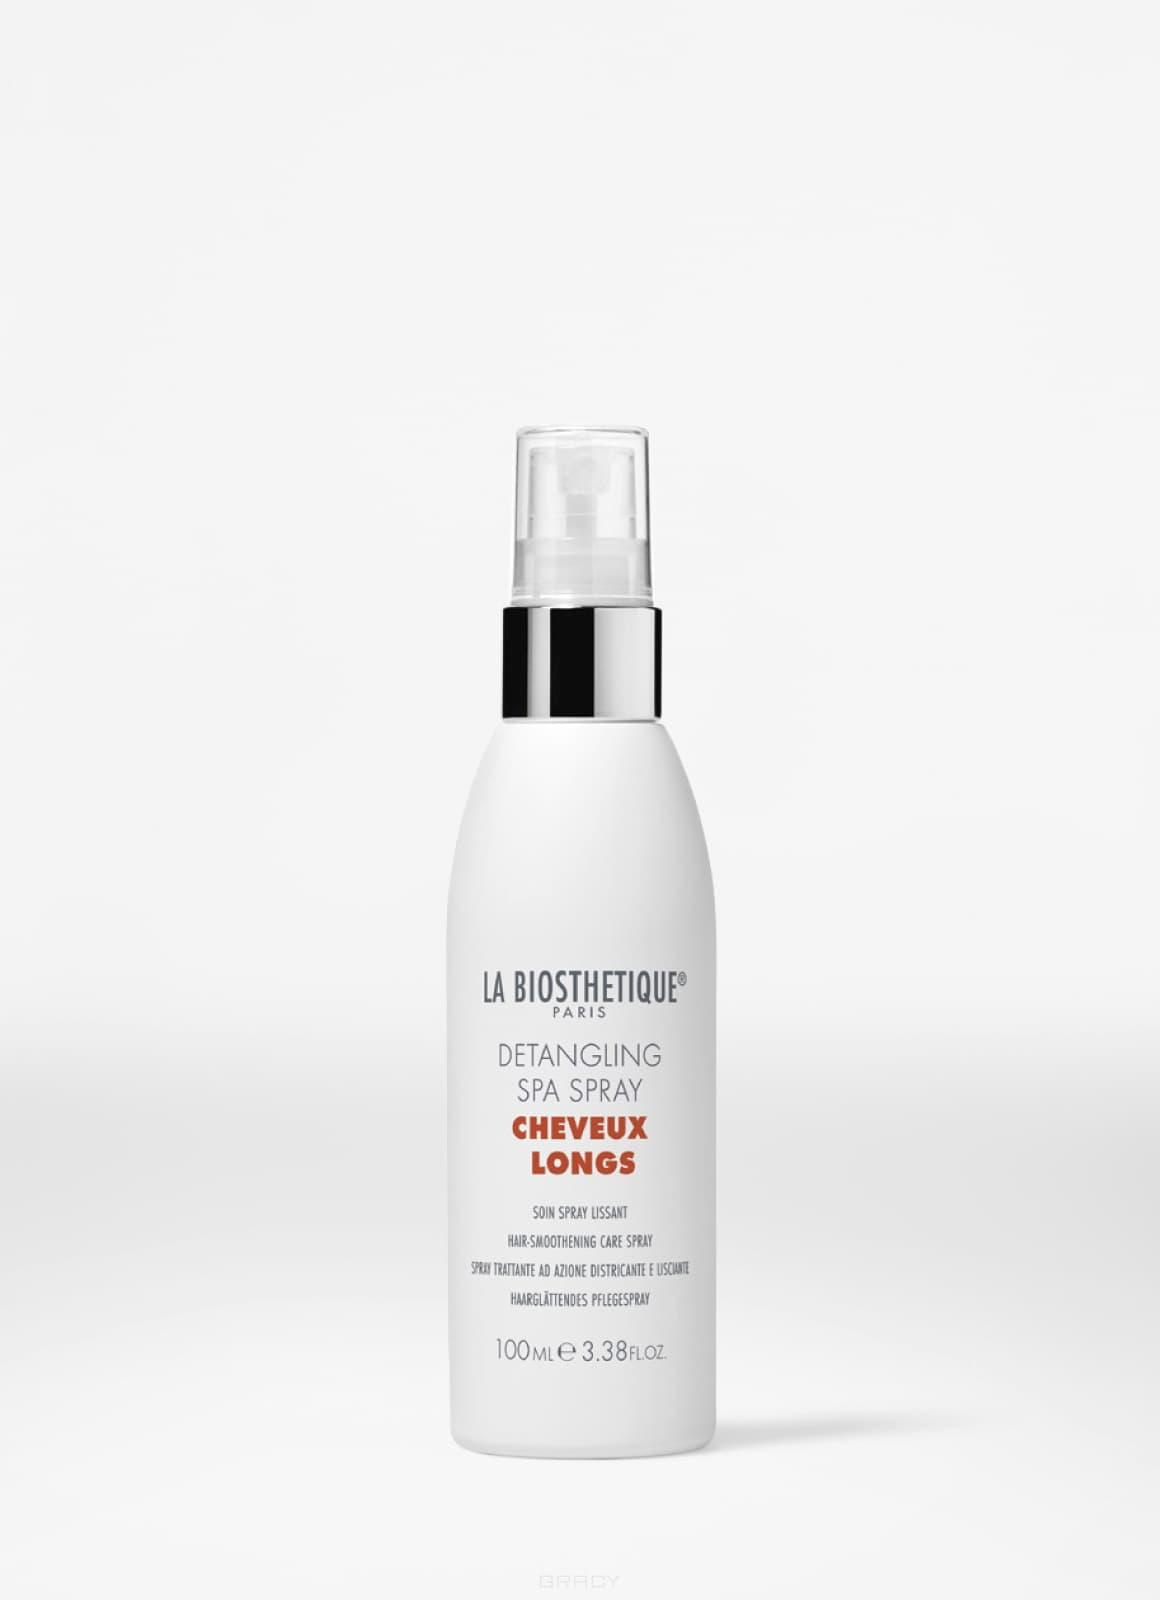 La Biosthetique SPA-спрей для придания гладкости волосам Detangling Spa Spray, 100 мл, SPA-спрей для придания гладкости волосам Detangling Spa Spray, 100 мл, 100 мл спрей labiosthetique heat protector 100 мл